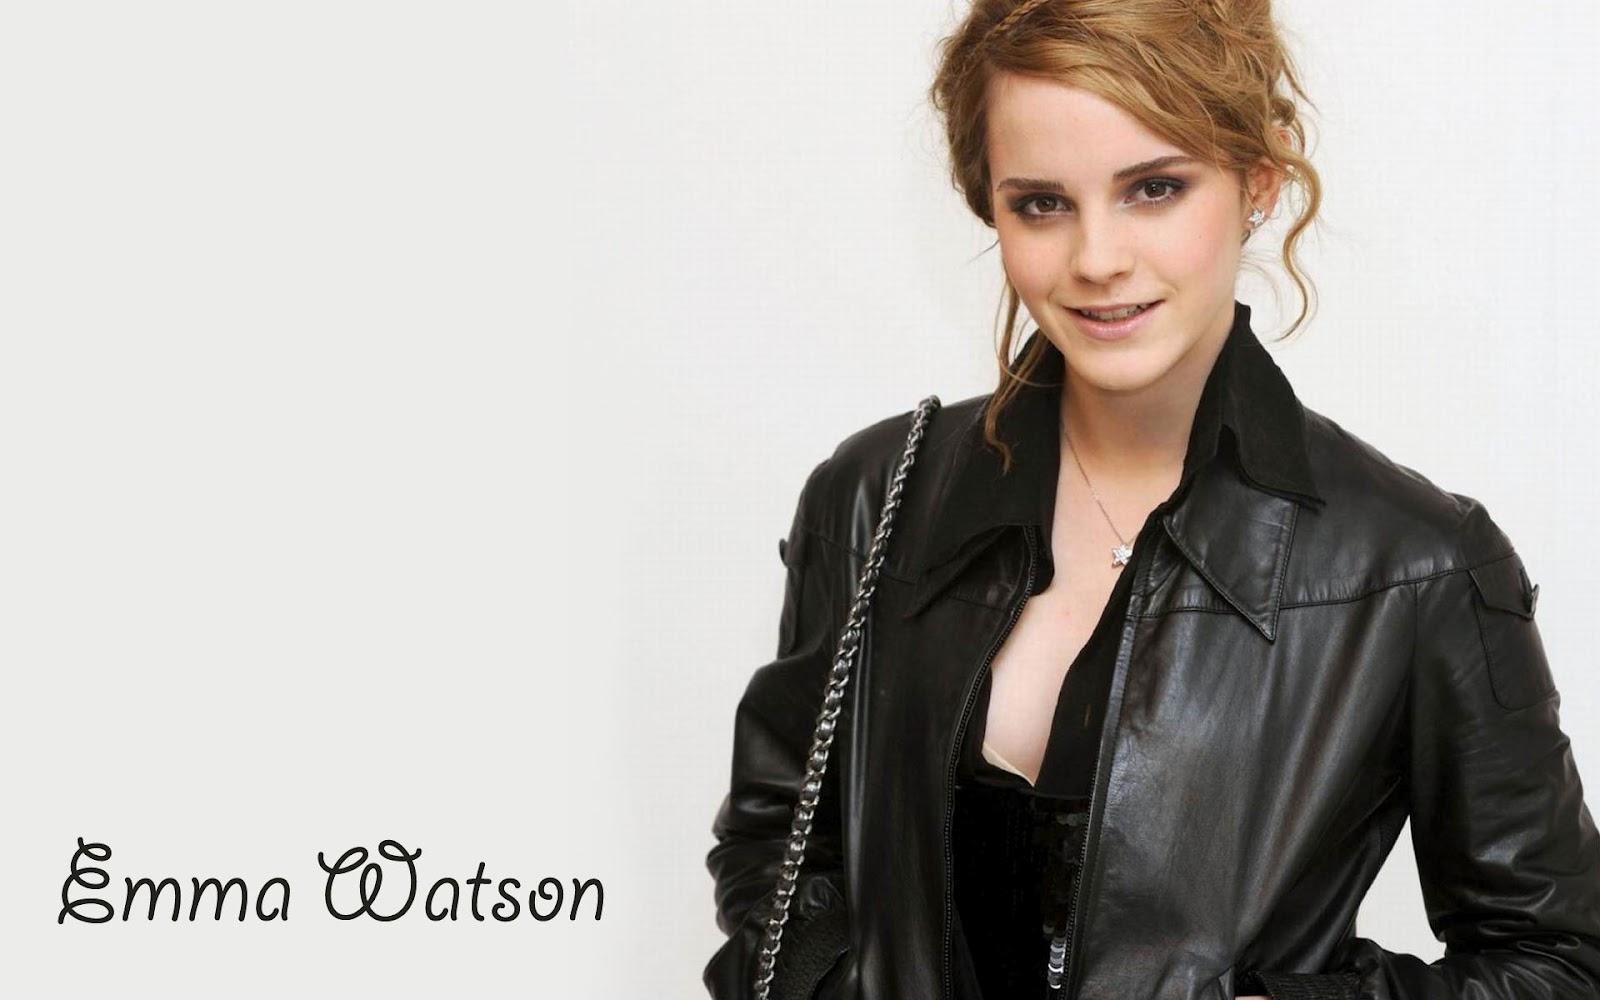 Emma Watson HDWallpaper 2012 6jpg 1600x1000